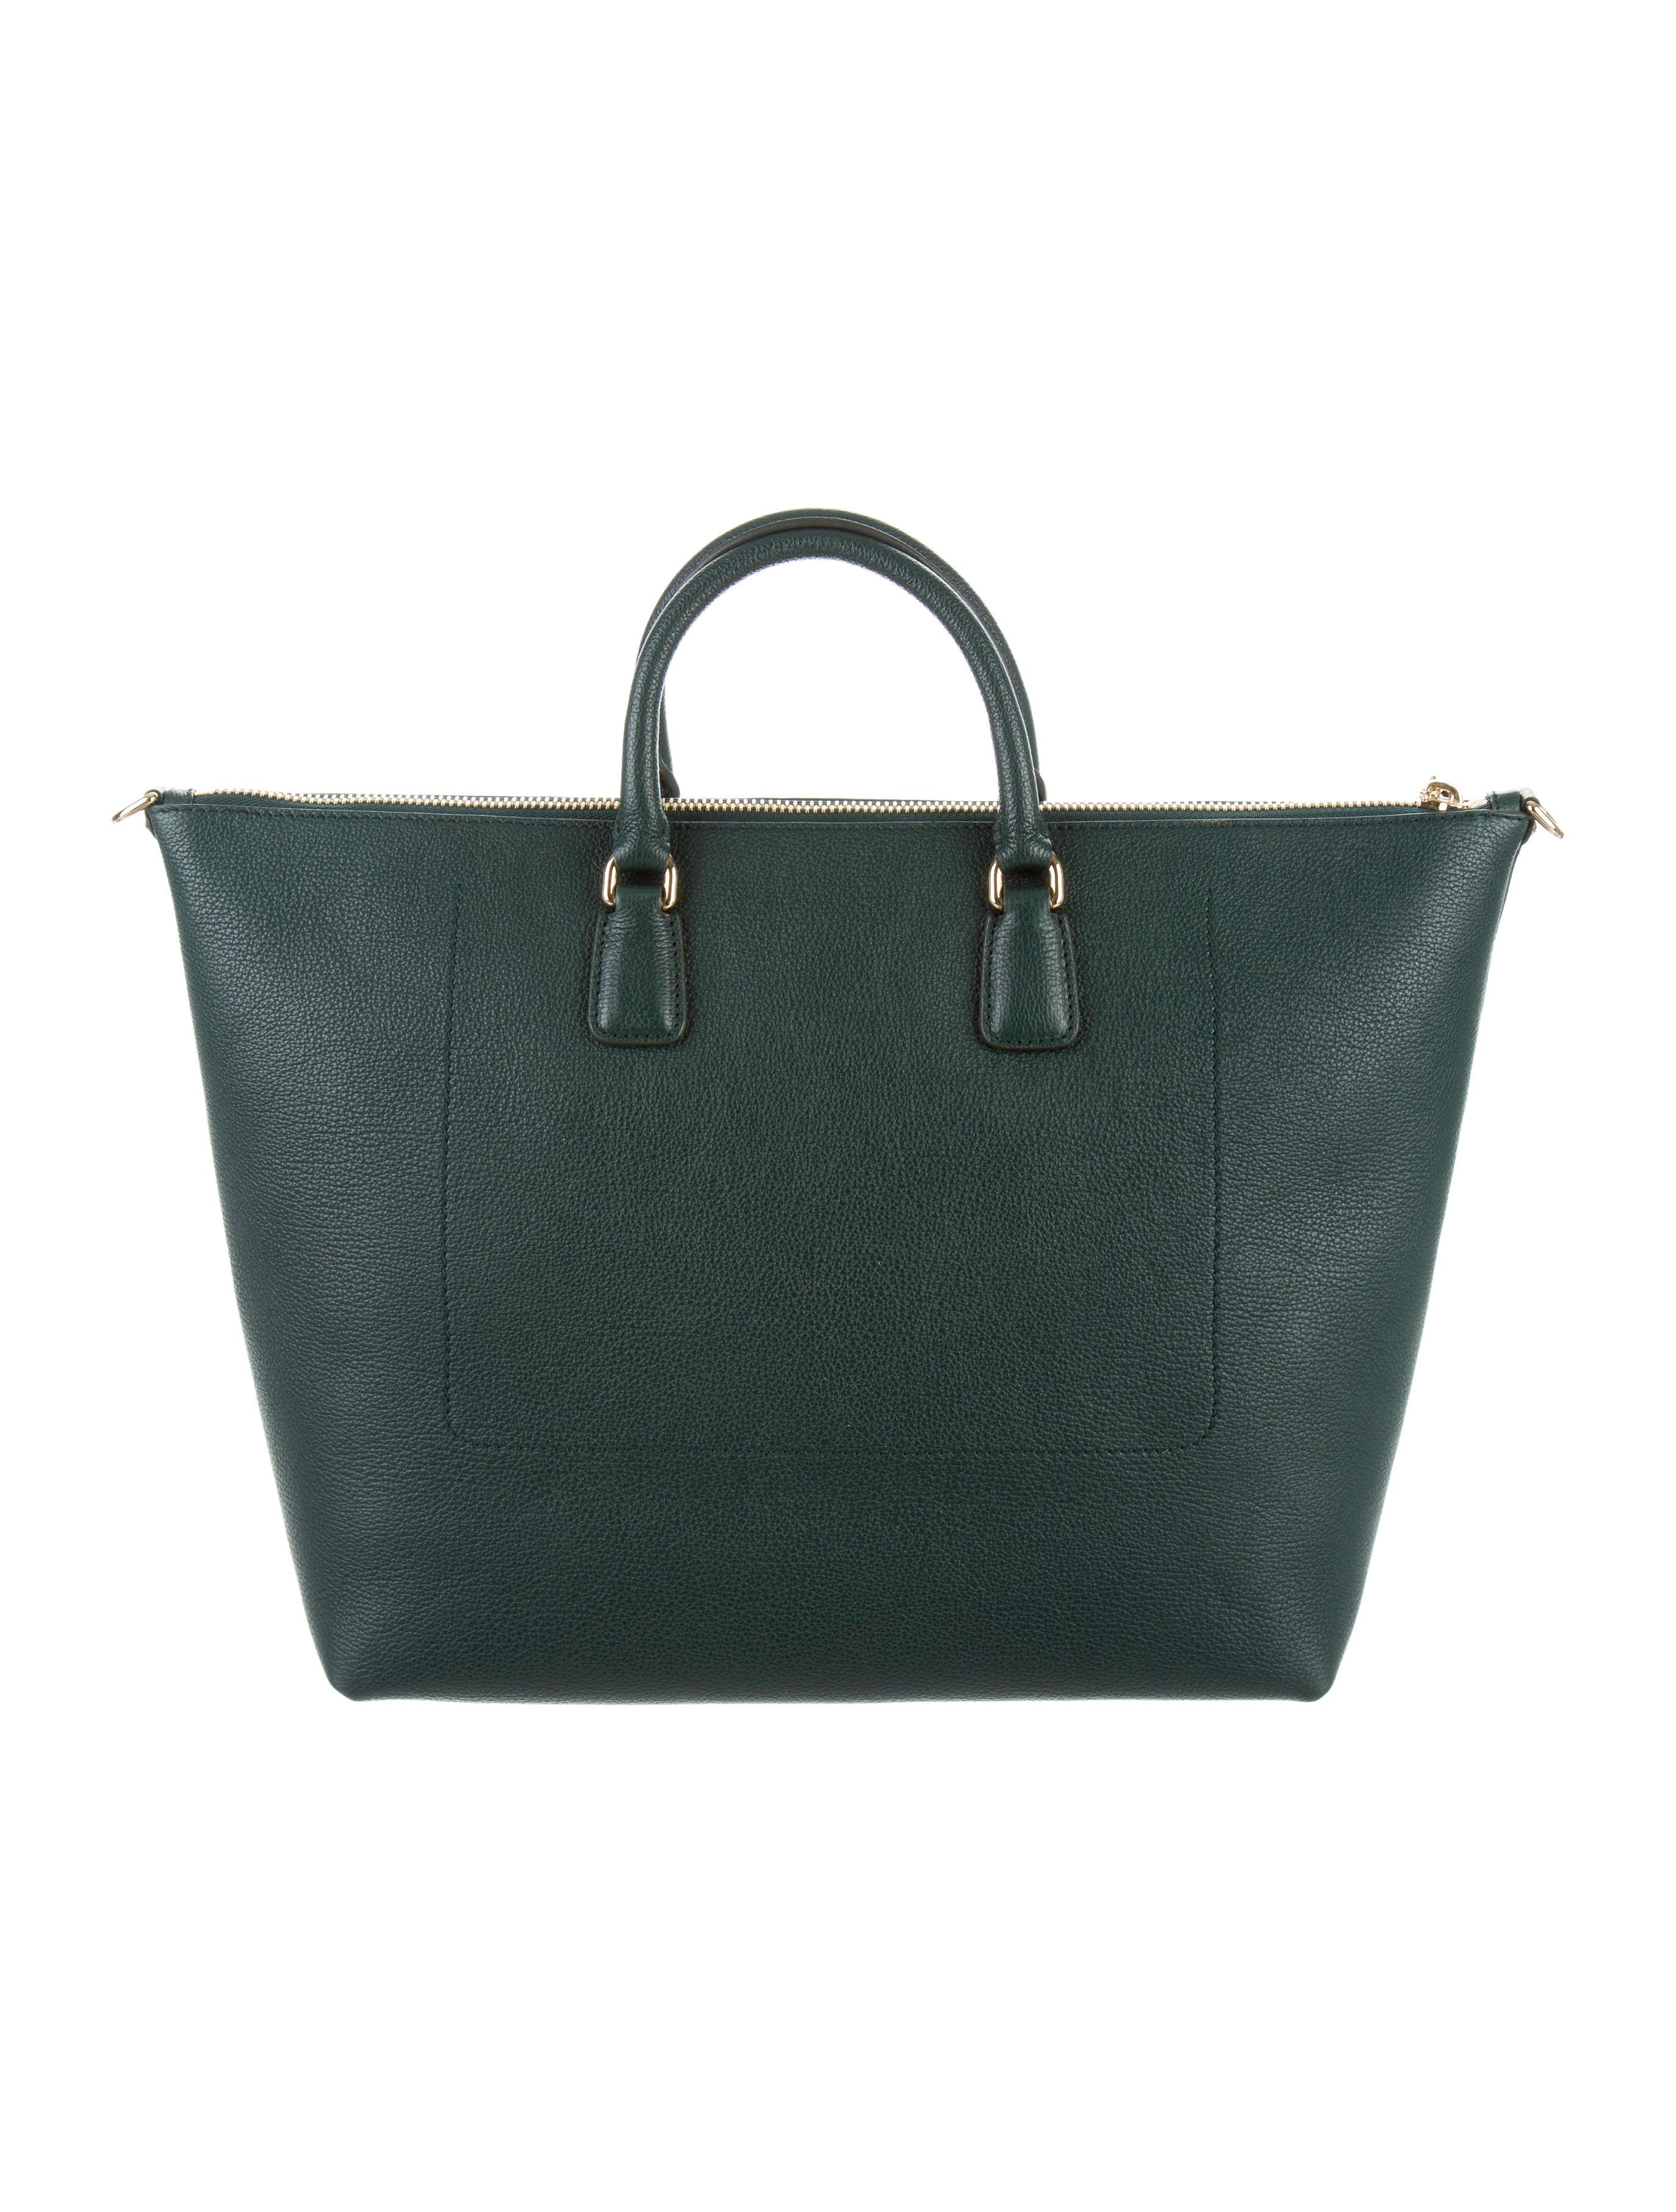 6aa1d8f16276 Dolce   Gabbana Pebbled Leather Satchel - Handbags - DAG91112